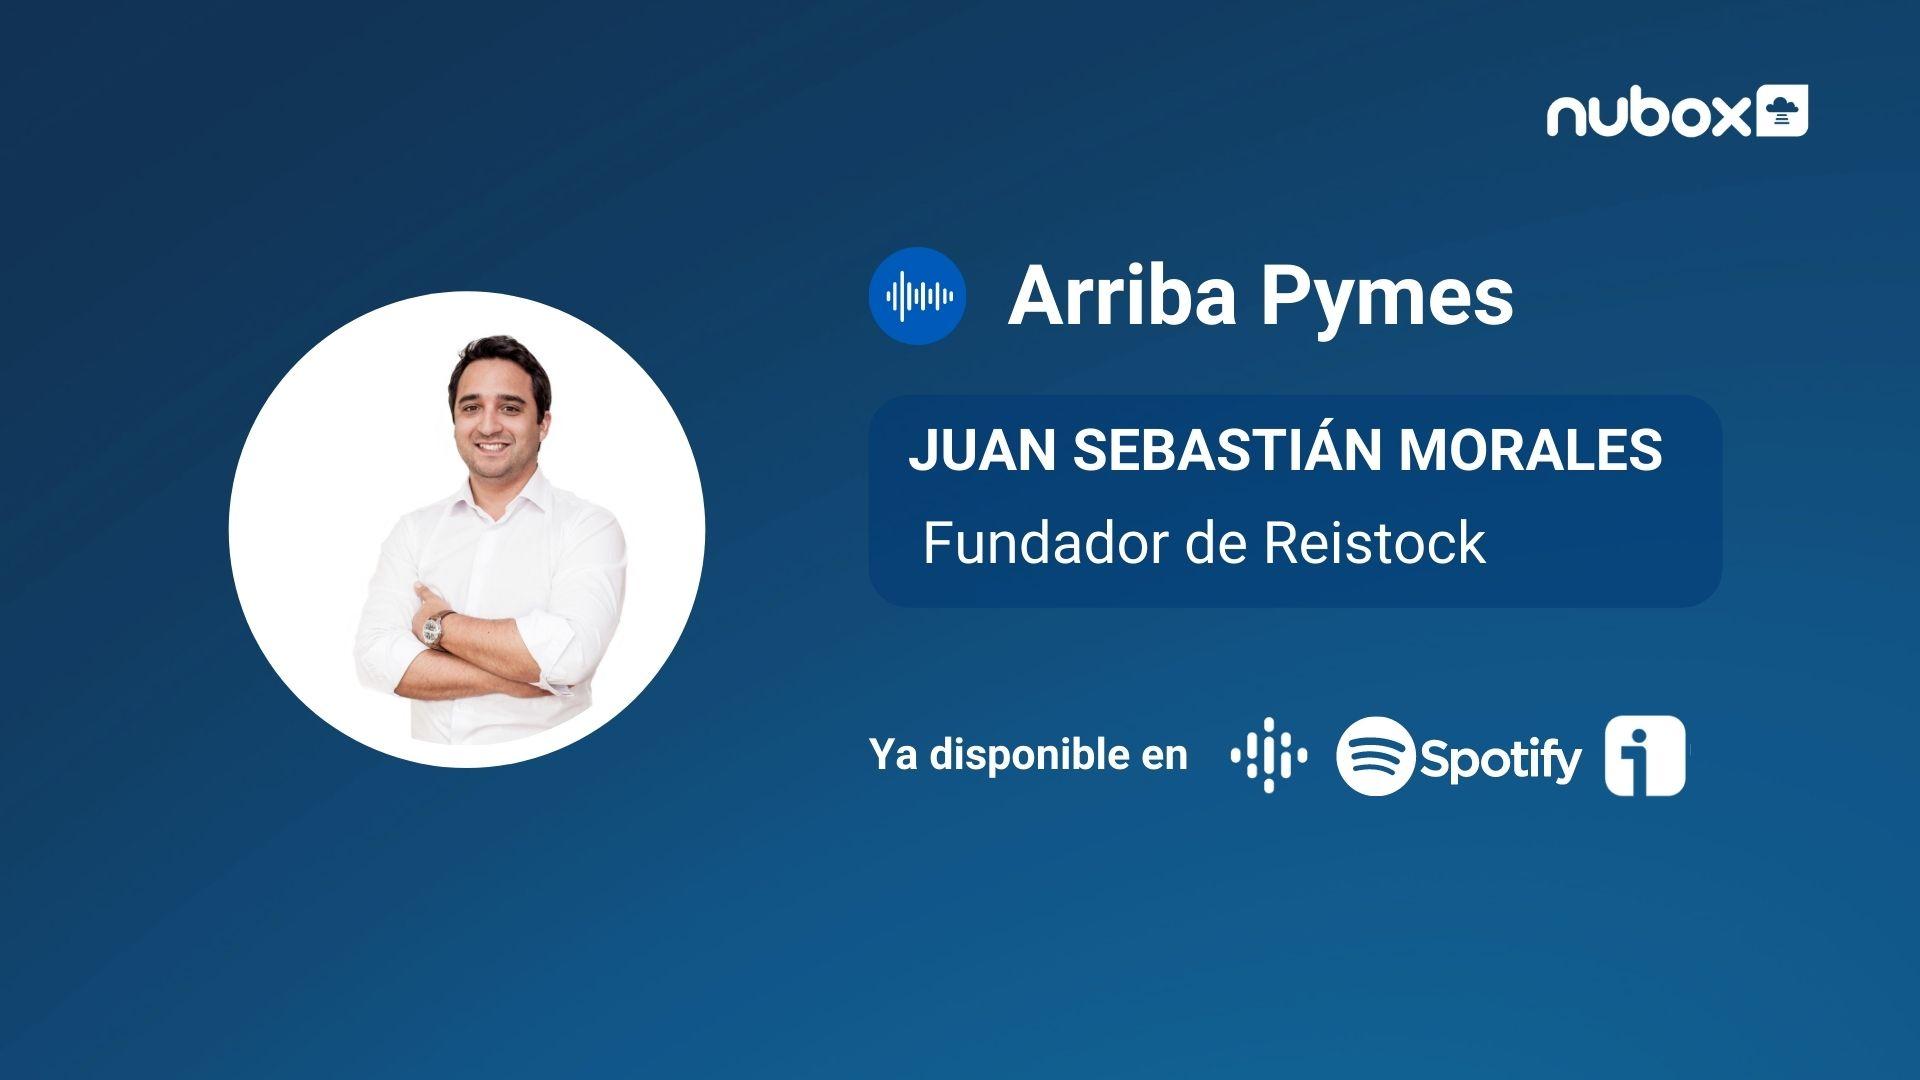 #Ep5 I Juan Sebastián Morales: Es buen momento para invertir porque la crisis generó oportunidades